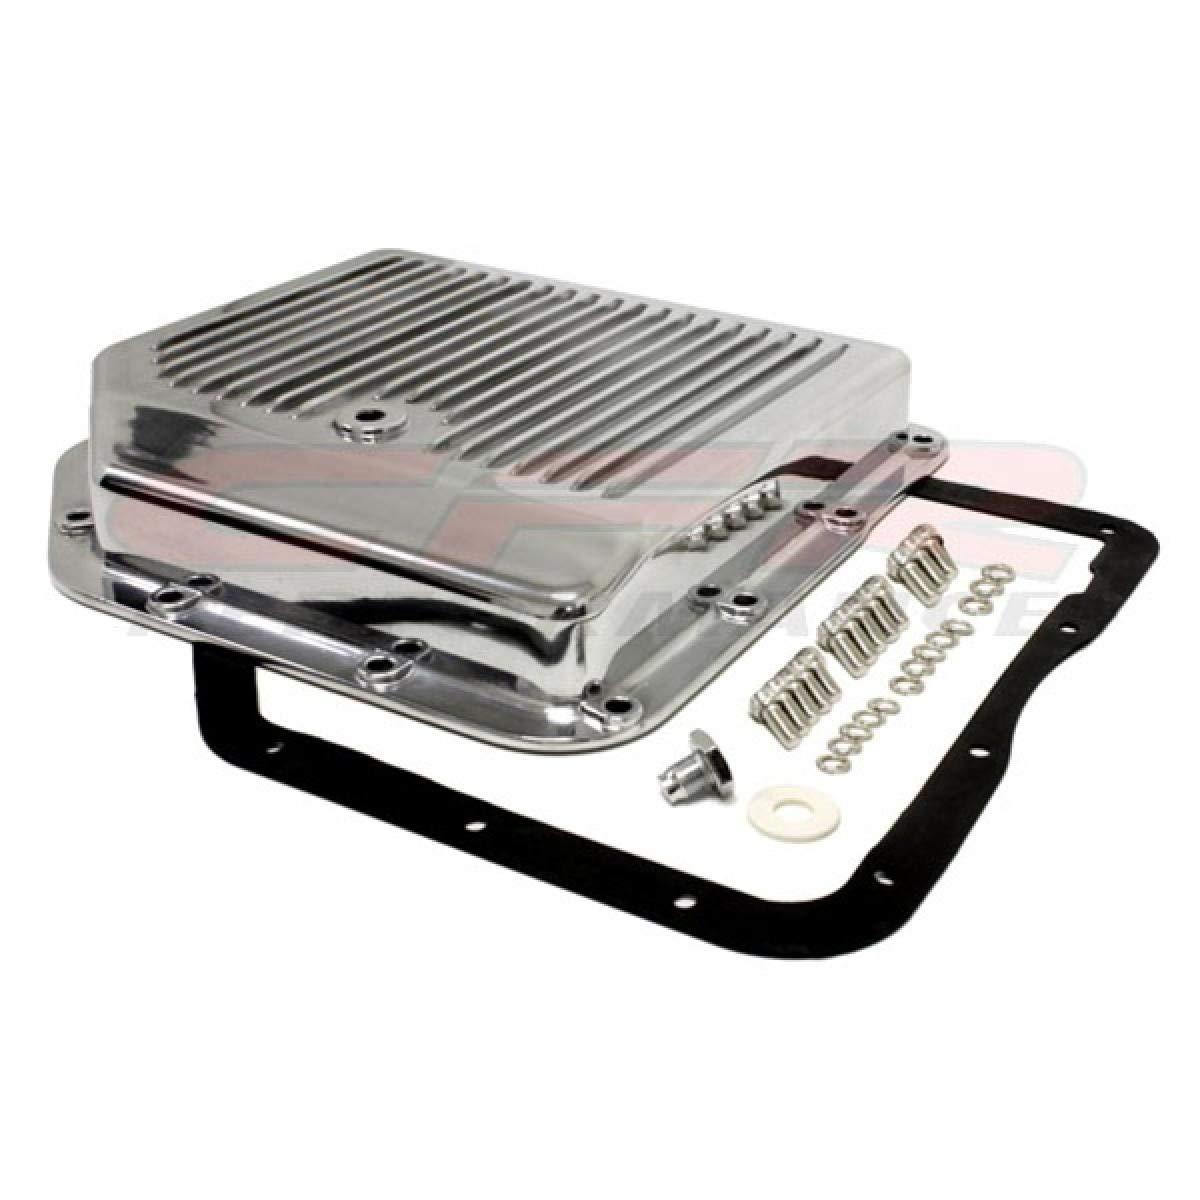 Polished Chevy//GM Turbo TH-350 Aluminum Transmission Pan Kit